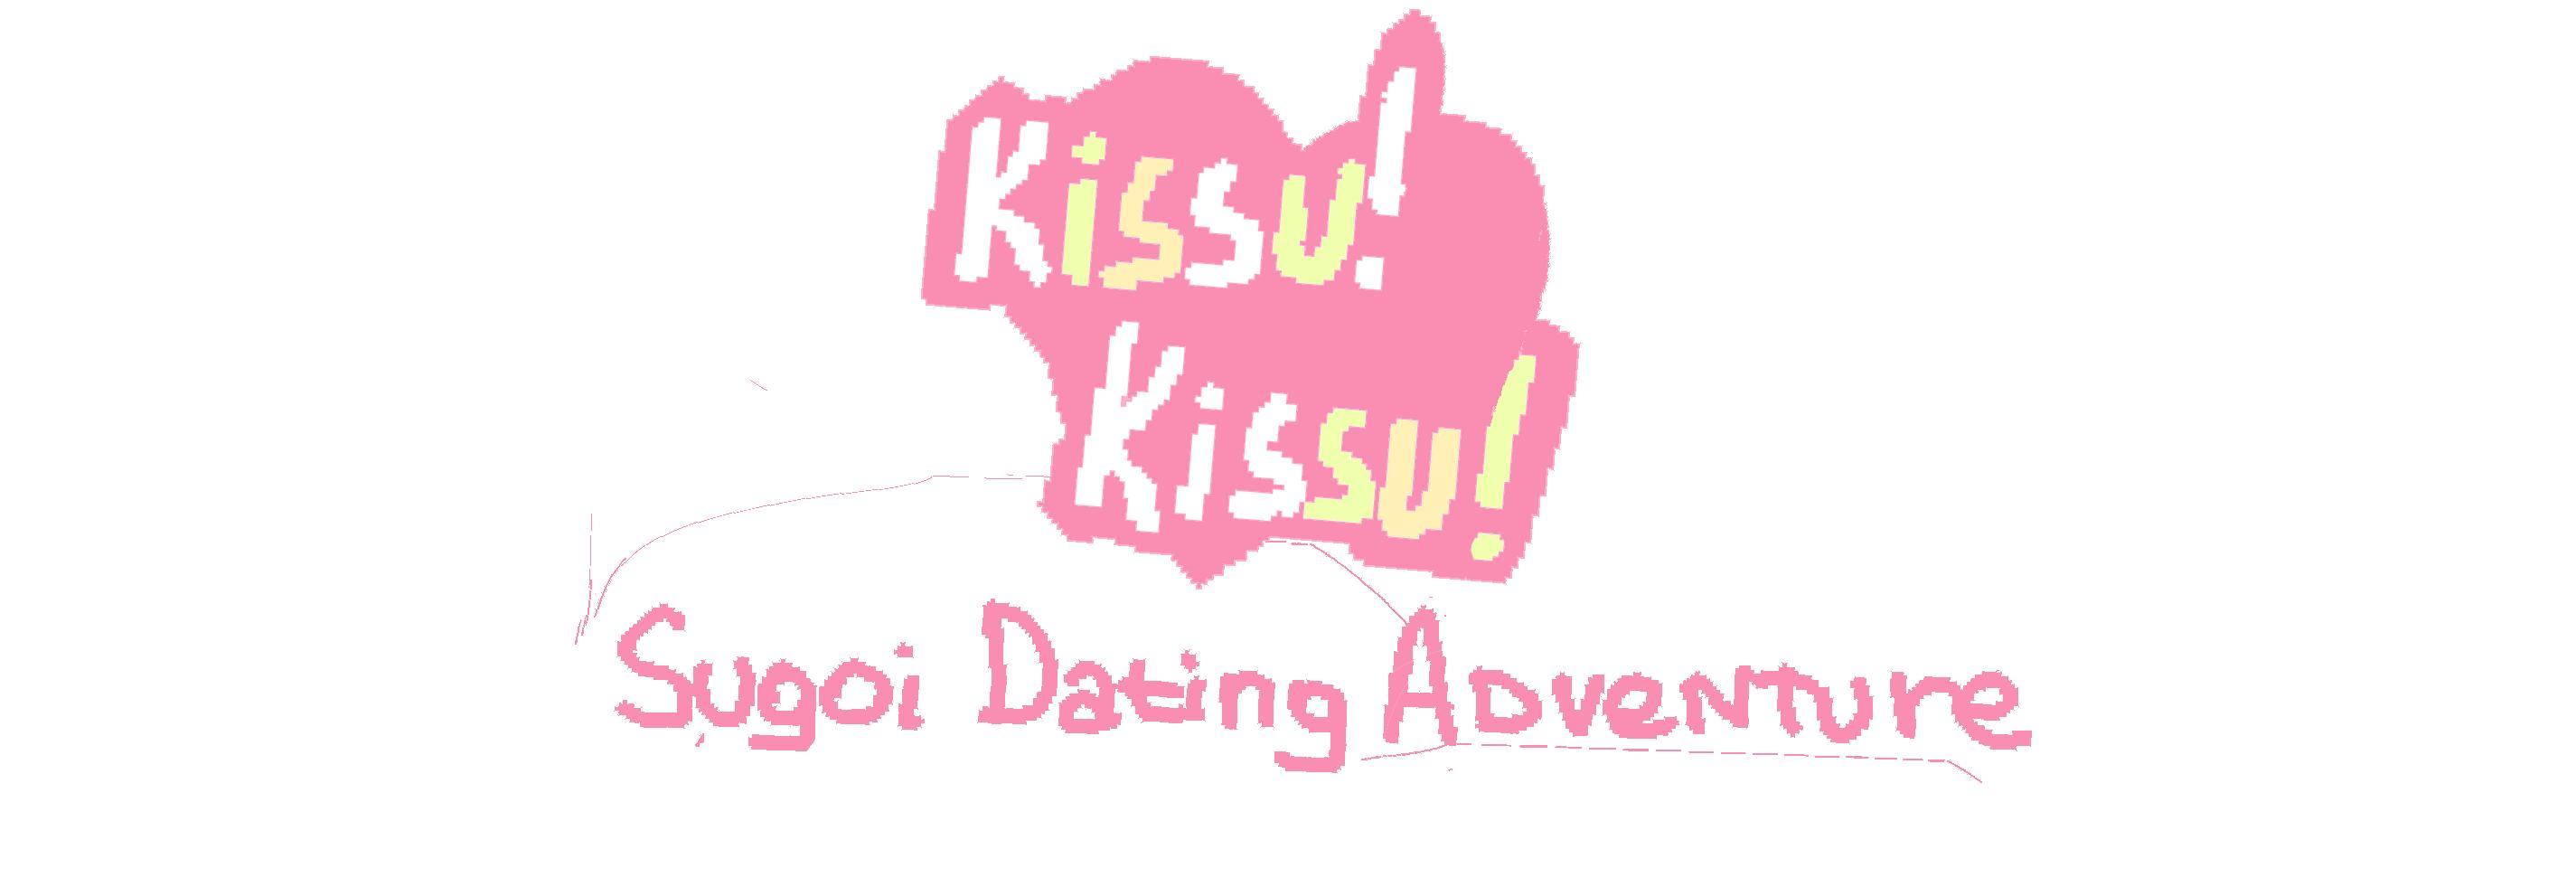 Kissu! Kissu! Sugoi Dating Adventure